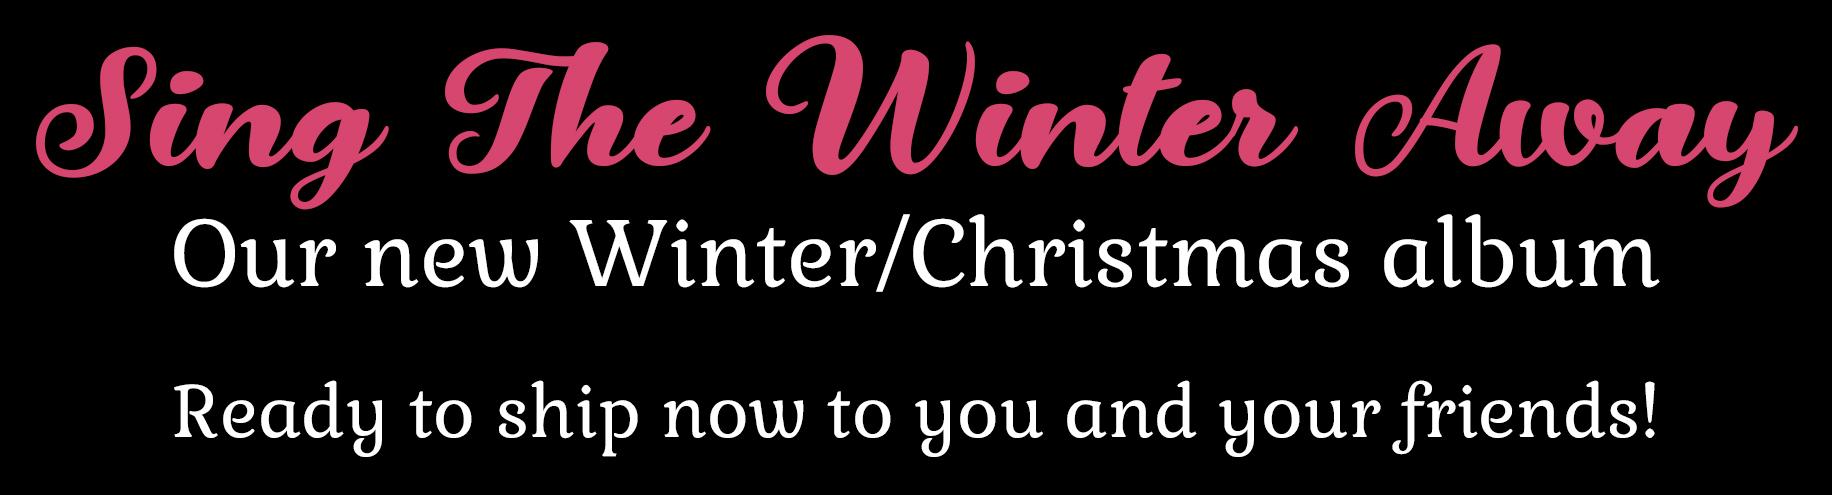 Winter-promo-banner3